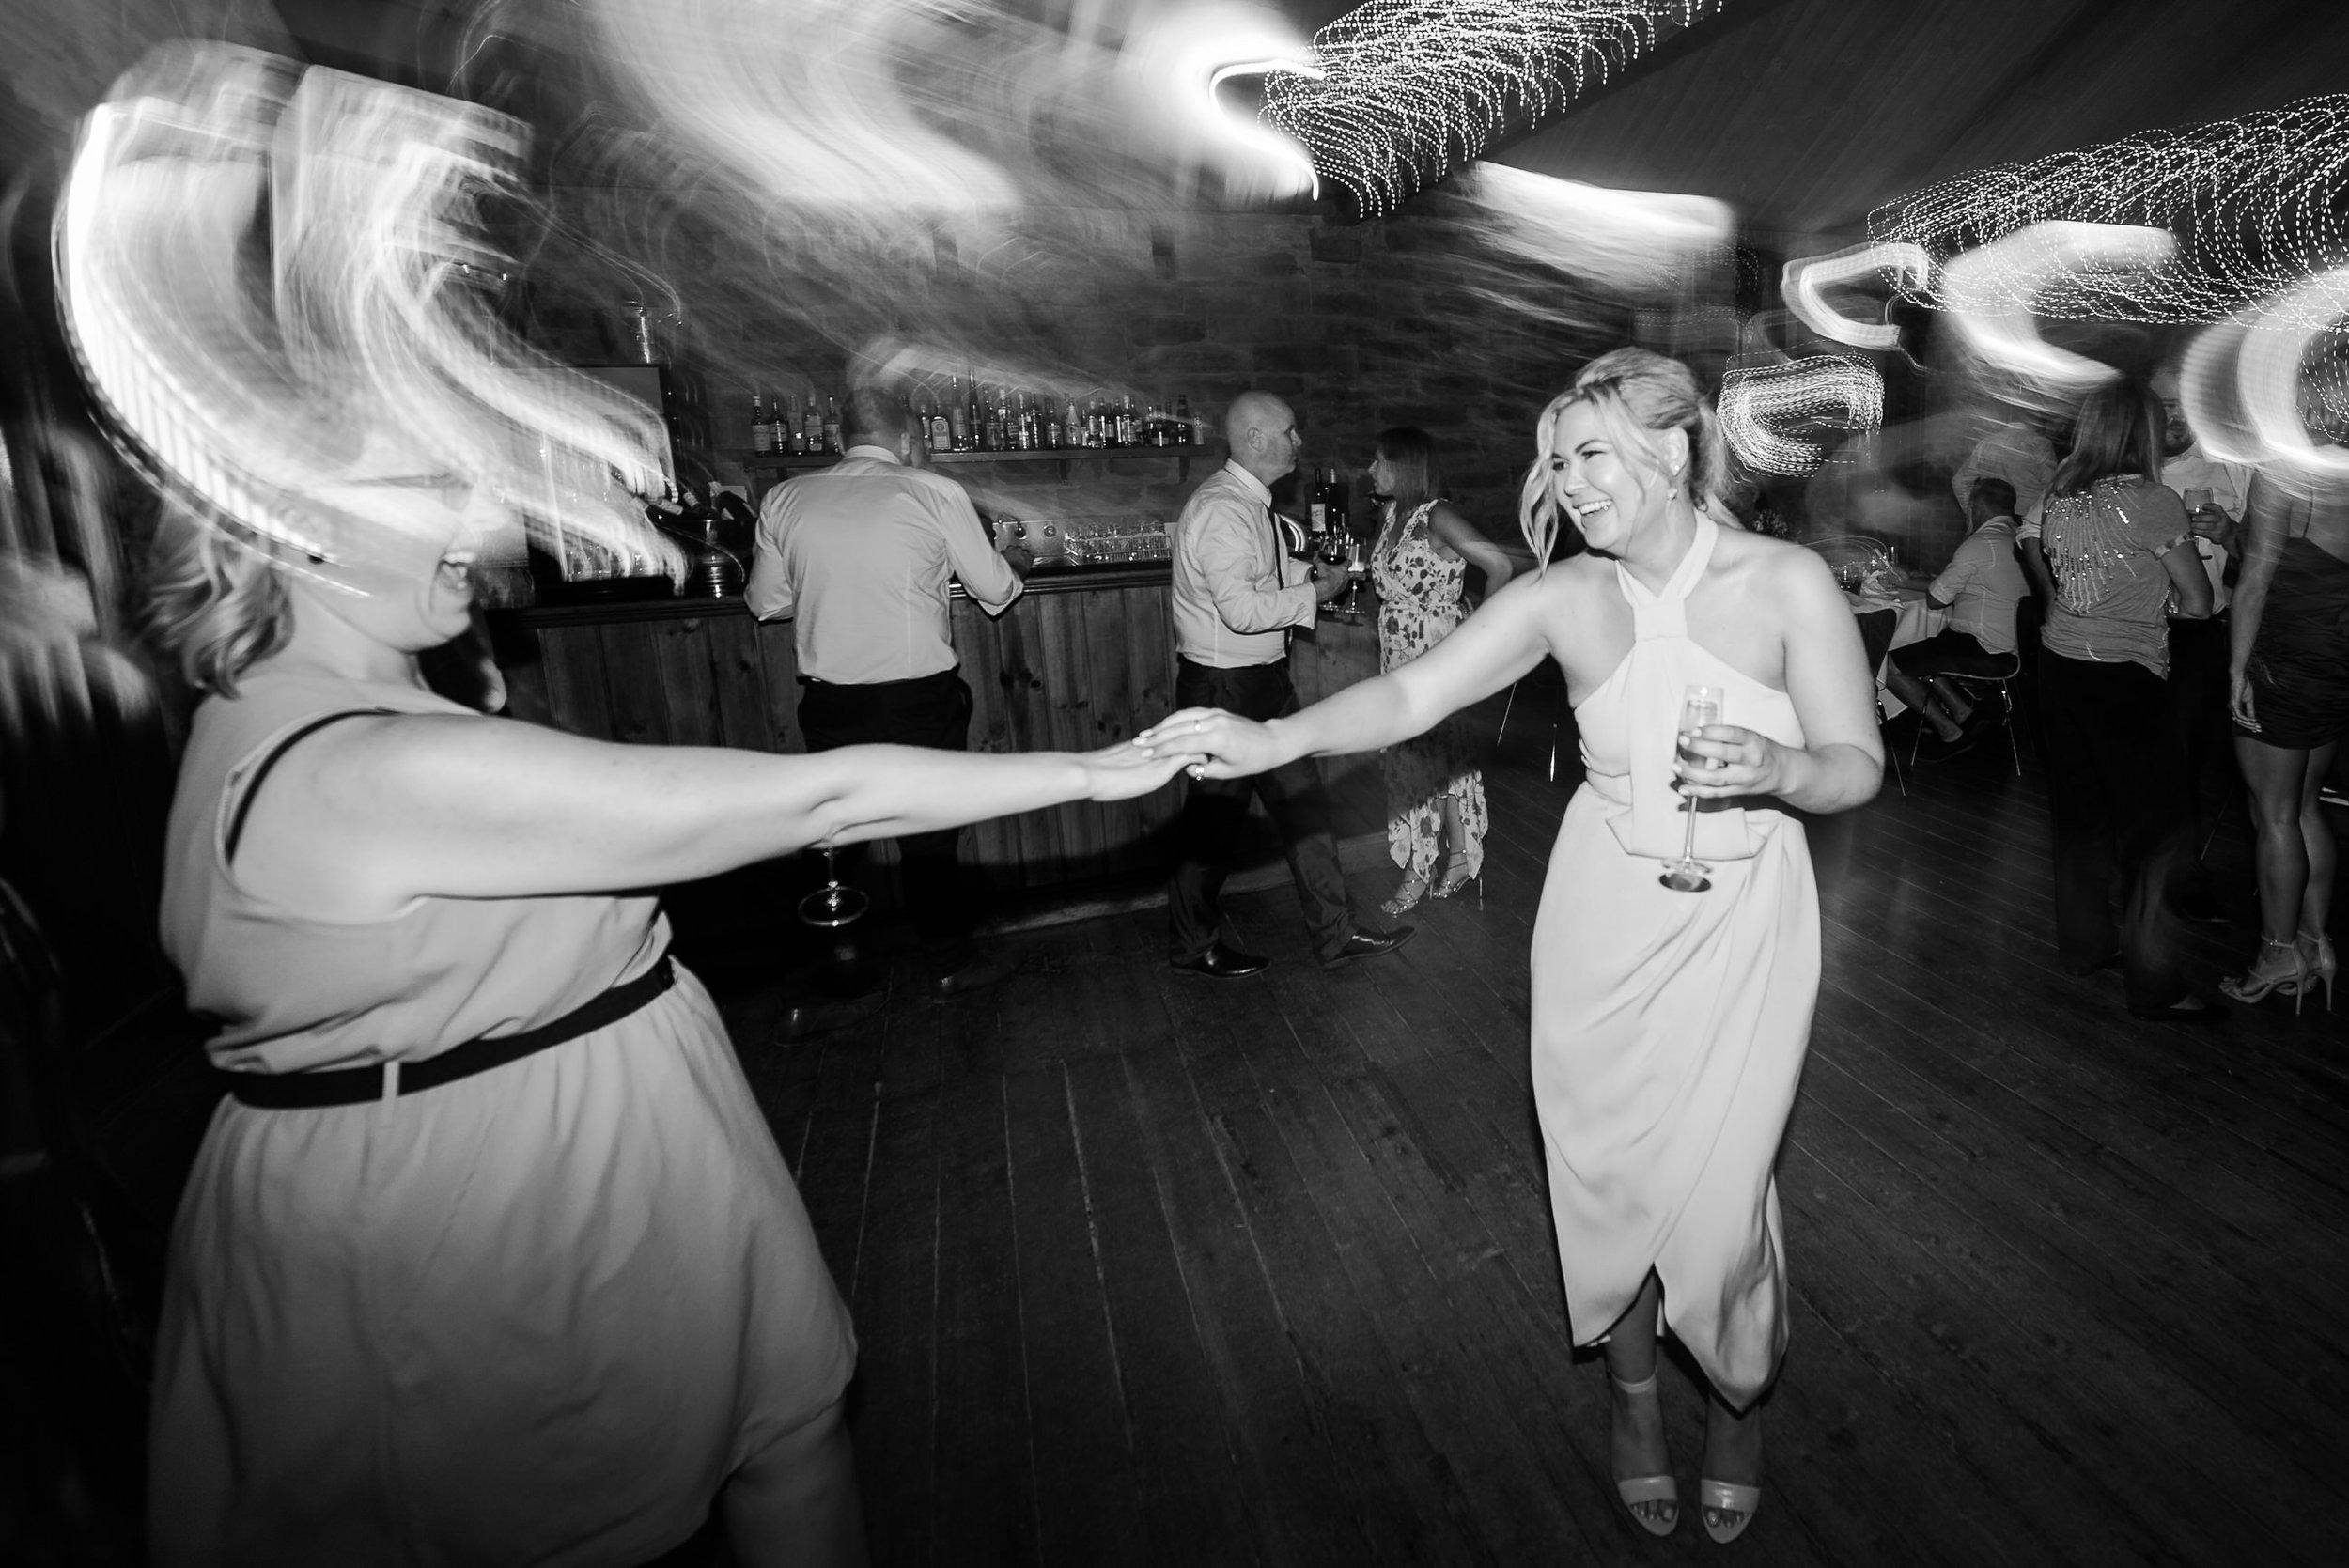 Justin_And_Jim_Photography_Chateau_Dore_Bendigo_Wedding104.JPG